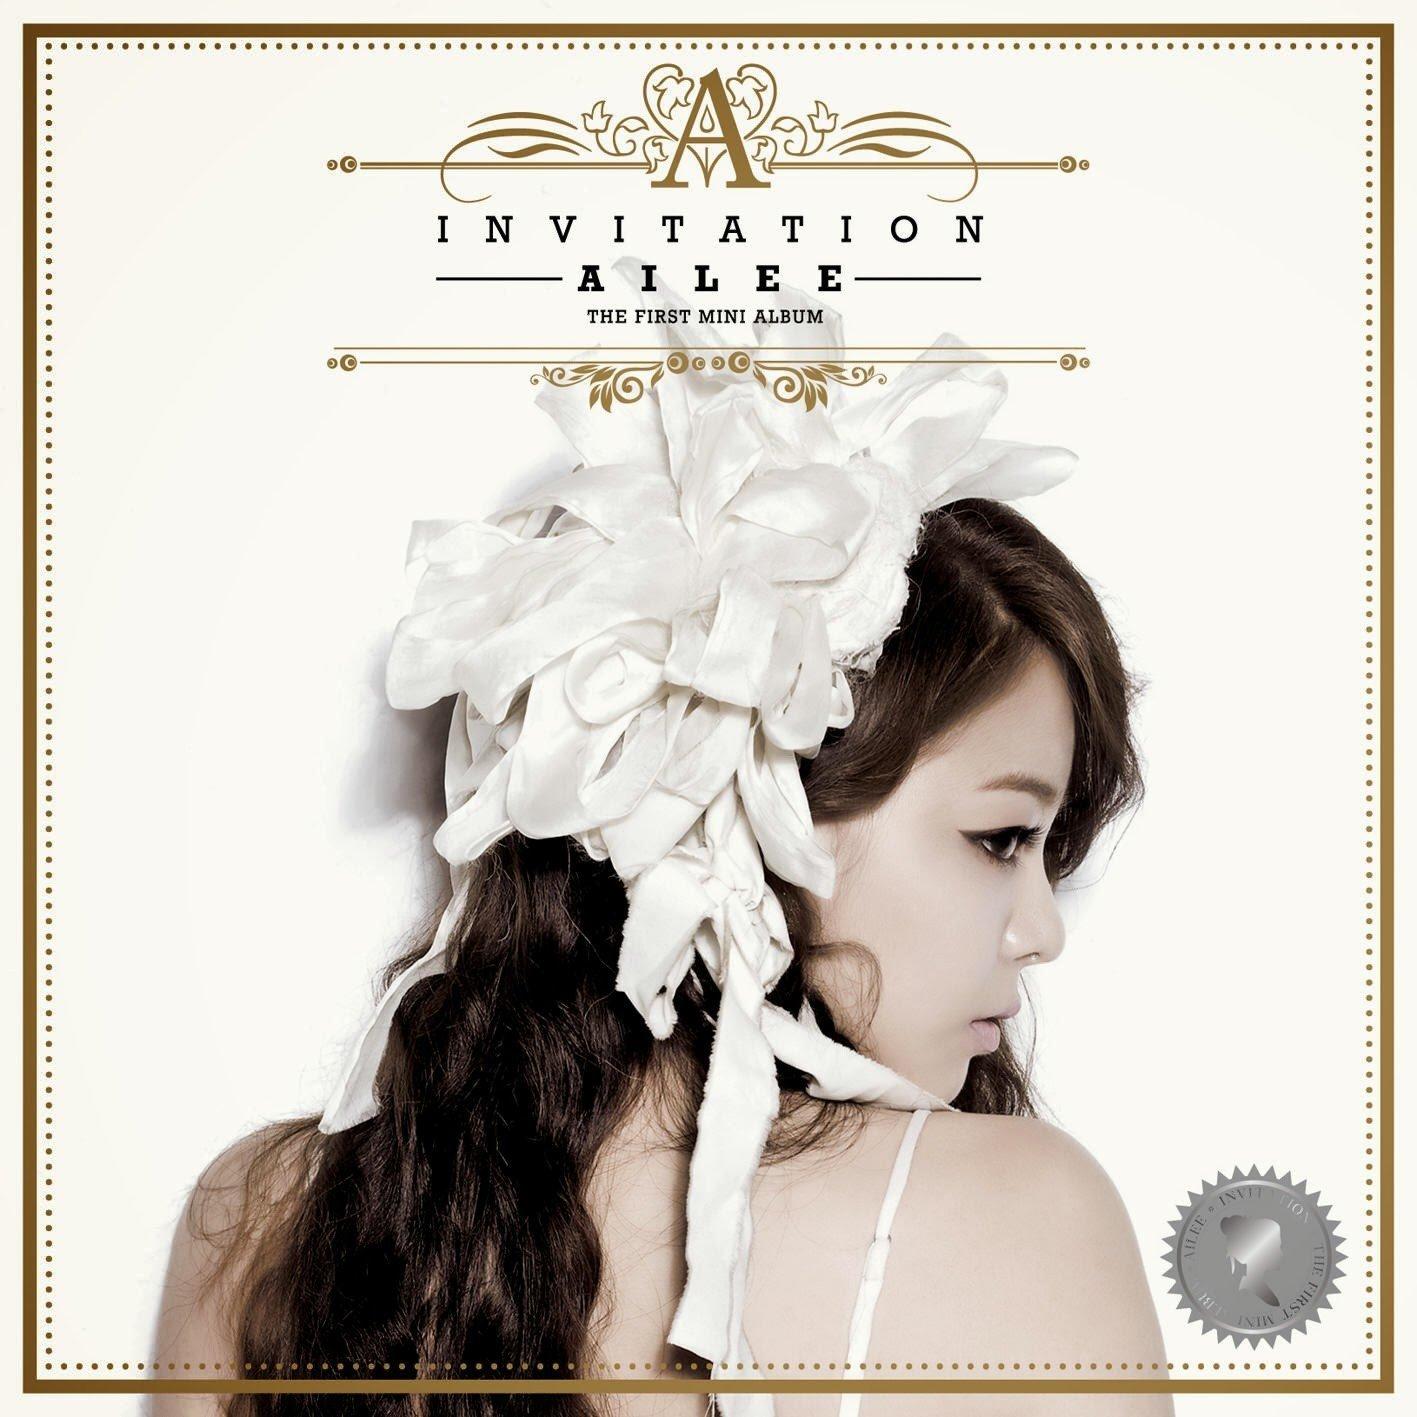 [Single] Ailee (에일리) – Invitation [FLAC / 24bit Lossless / WEB] [2012.10.16]